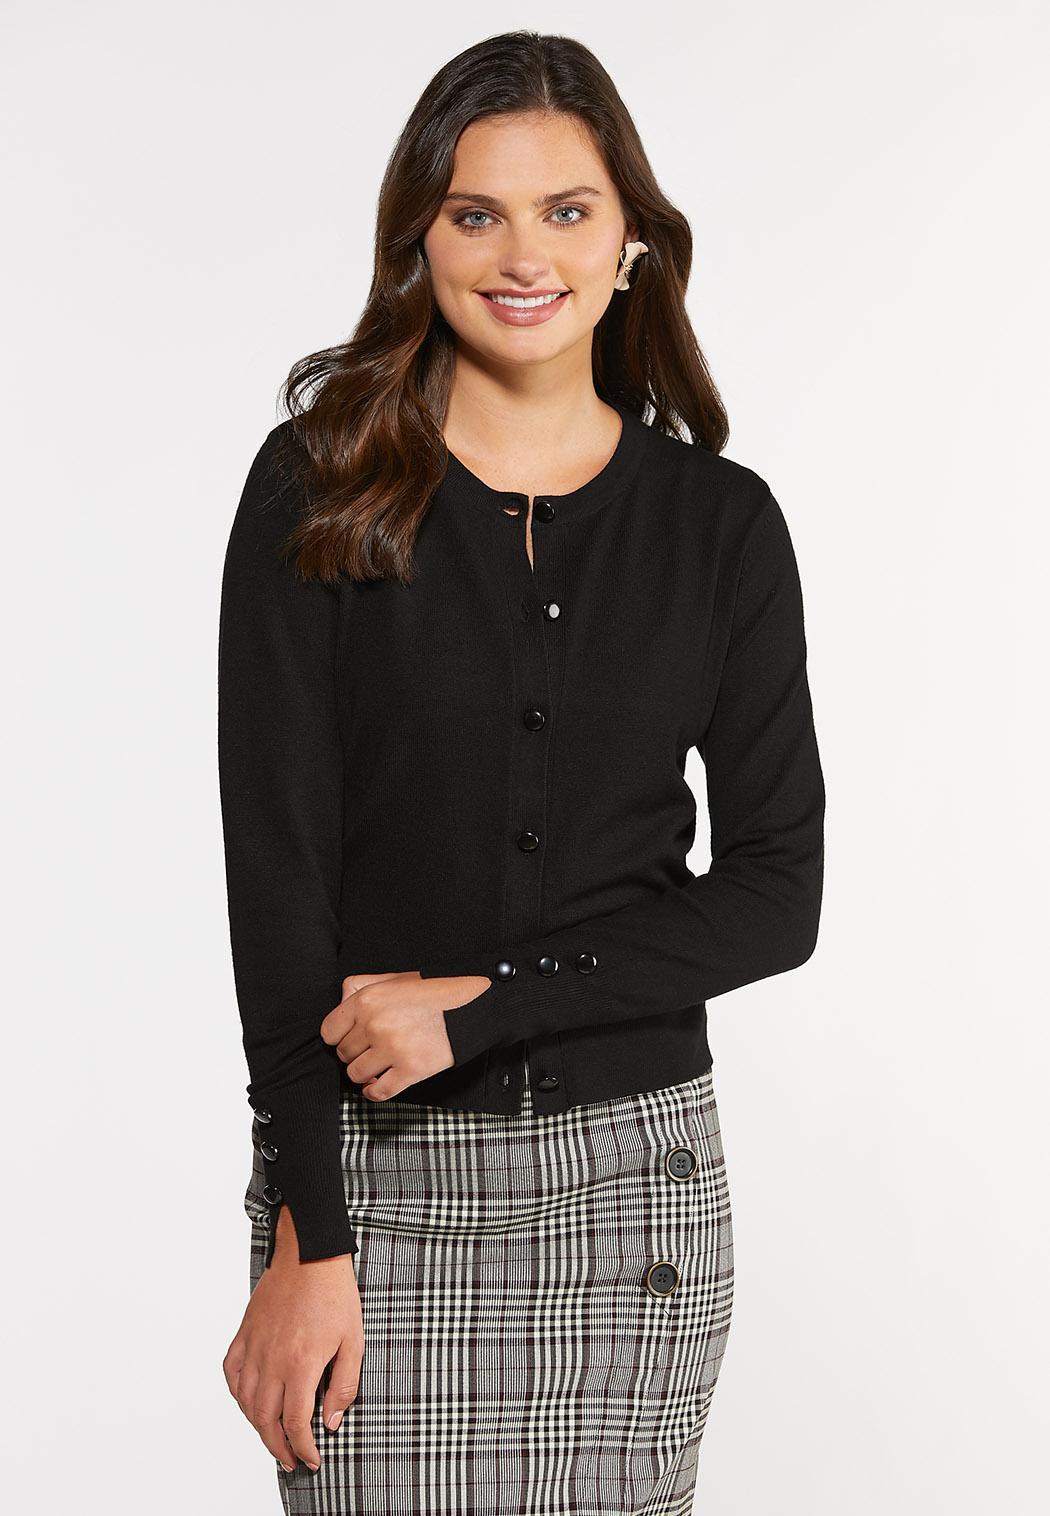 Classic Black Cardigan Sweater